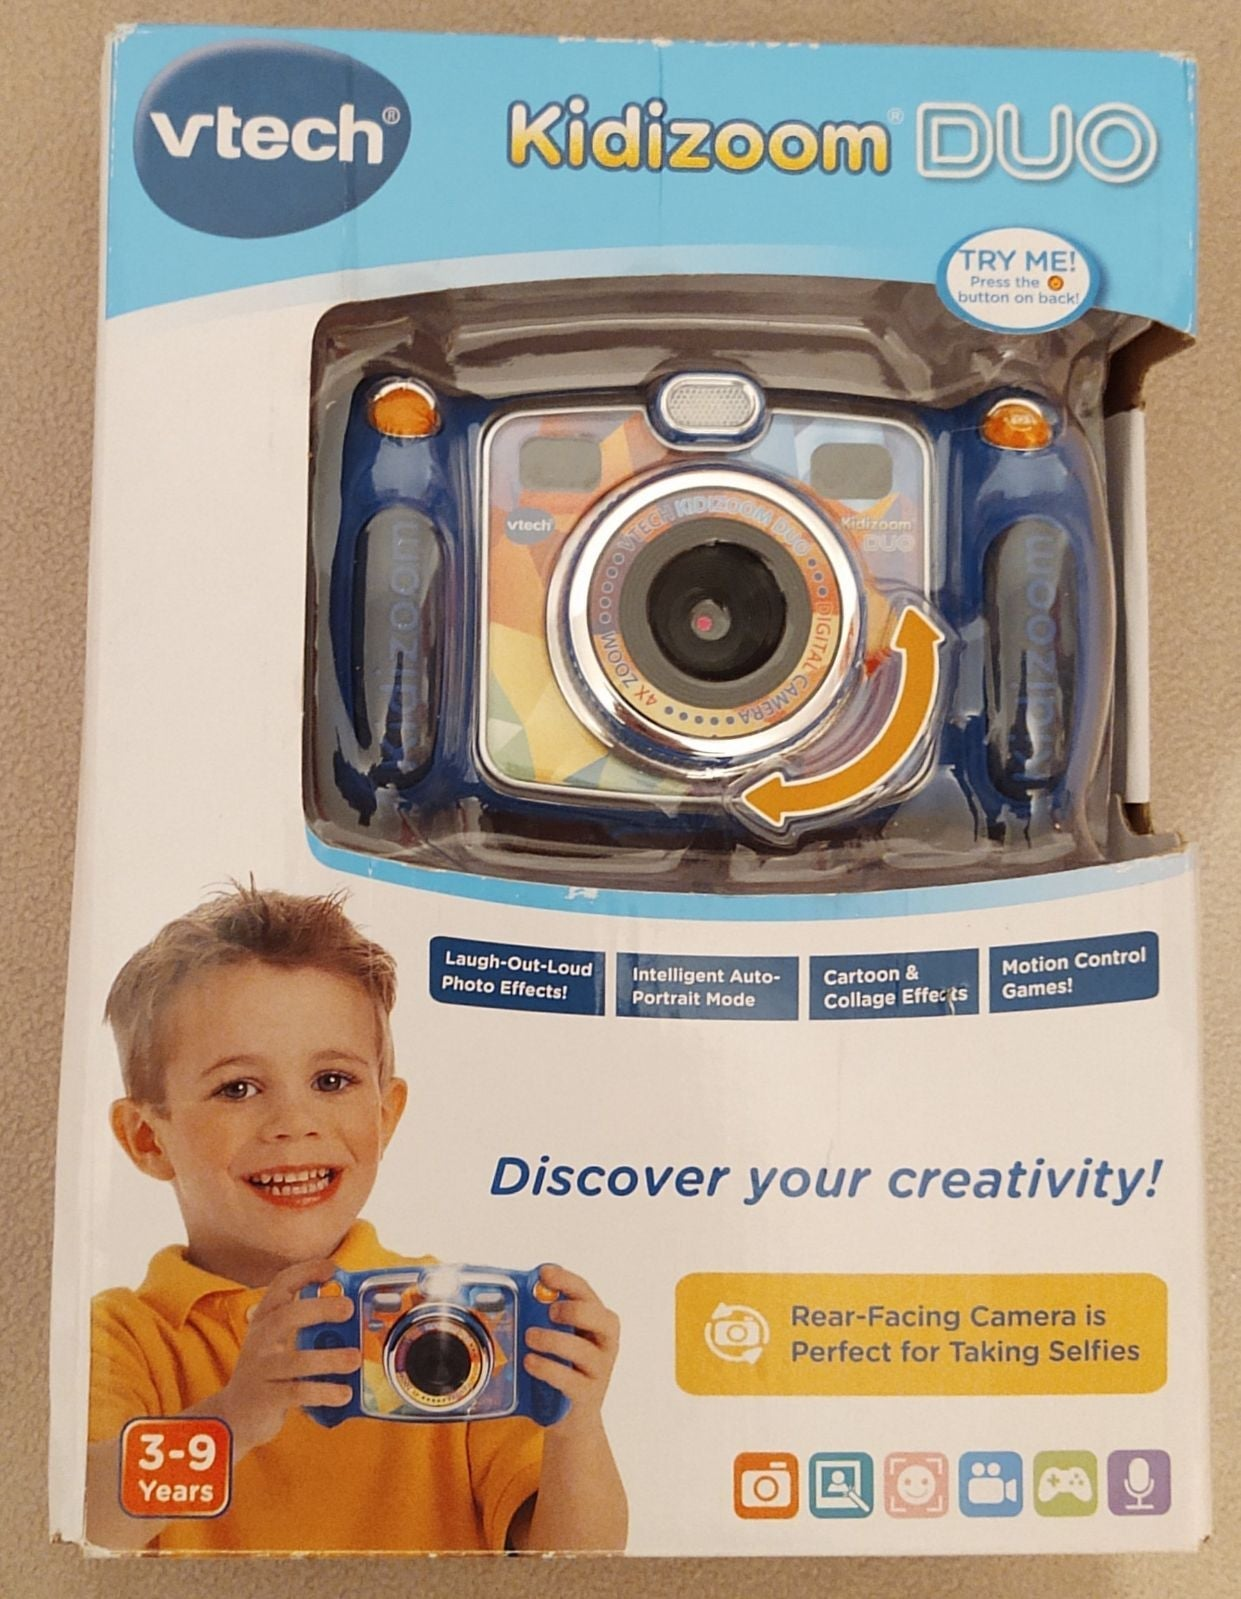 NEW VTech Kidizoom Duo Selfie Camera